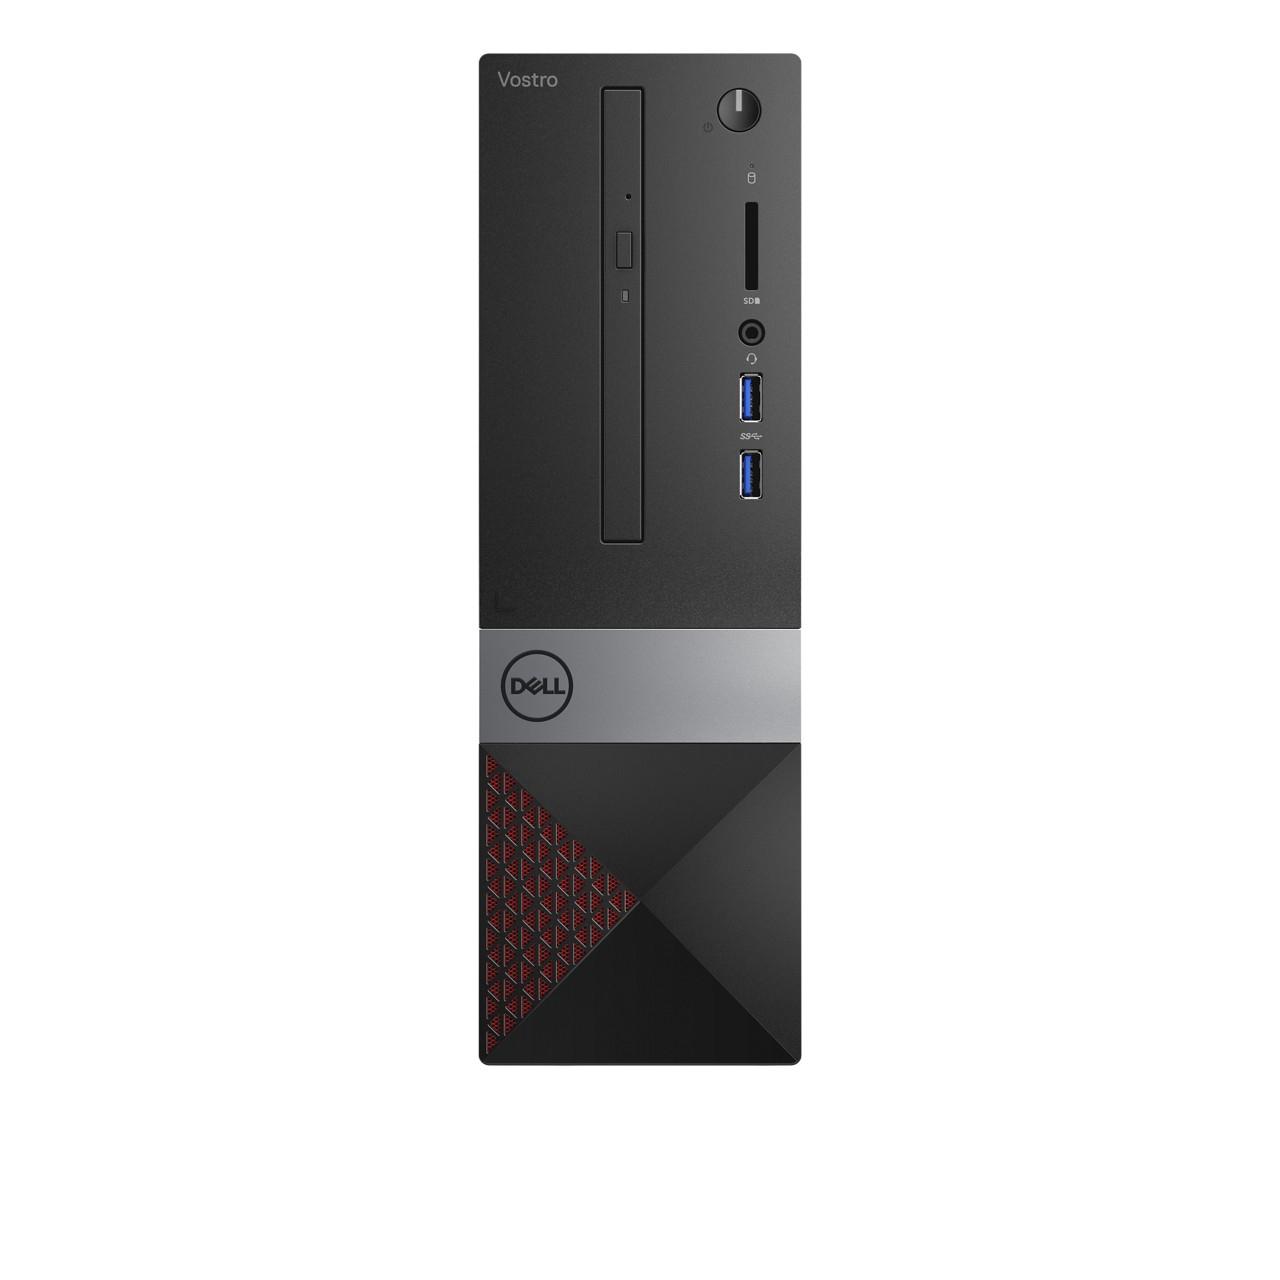 DELL Vostro 3470 Intel® 8ste generatie Core™ i3 i3-8100 4 GB DDR4-SDRAM 128 GB HDD Zwart, Grijs, Rood SFF PC